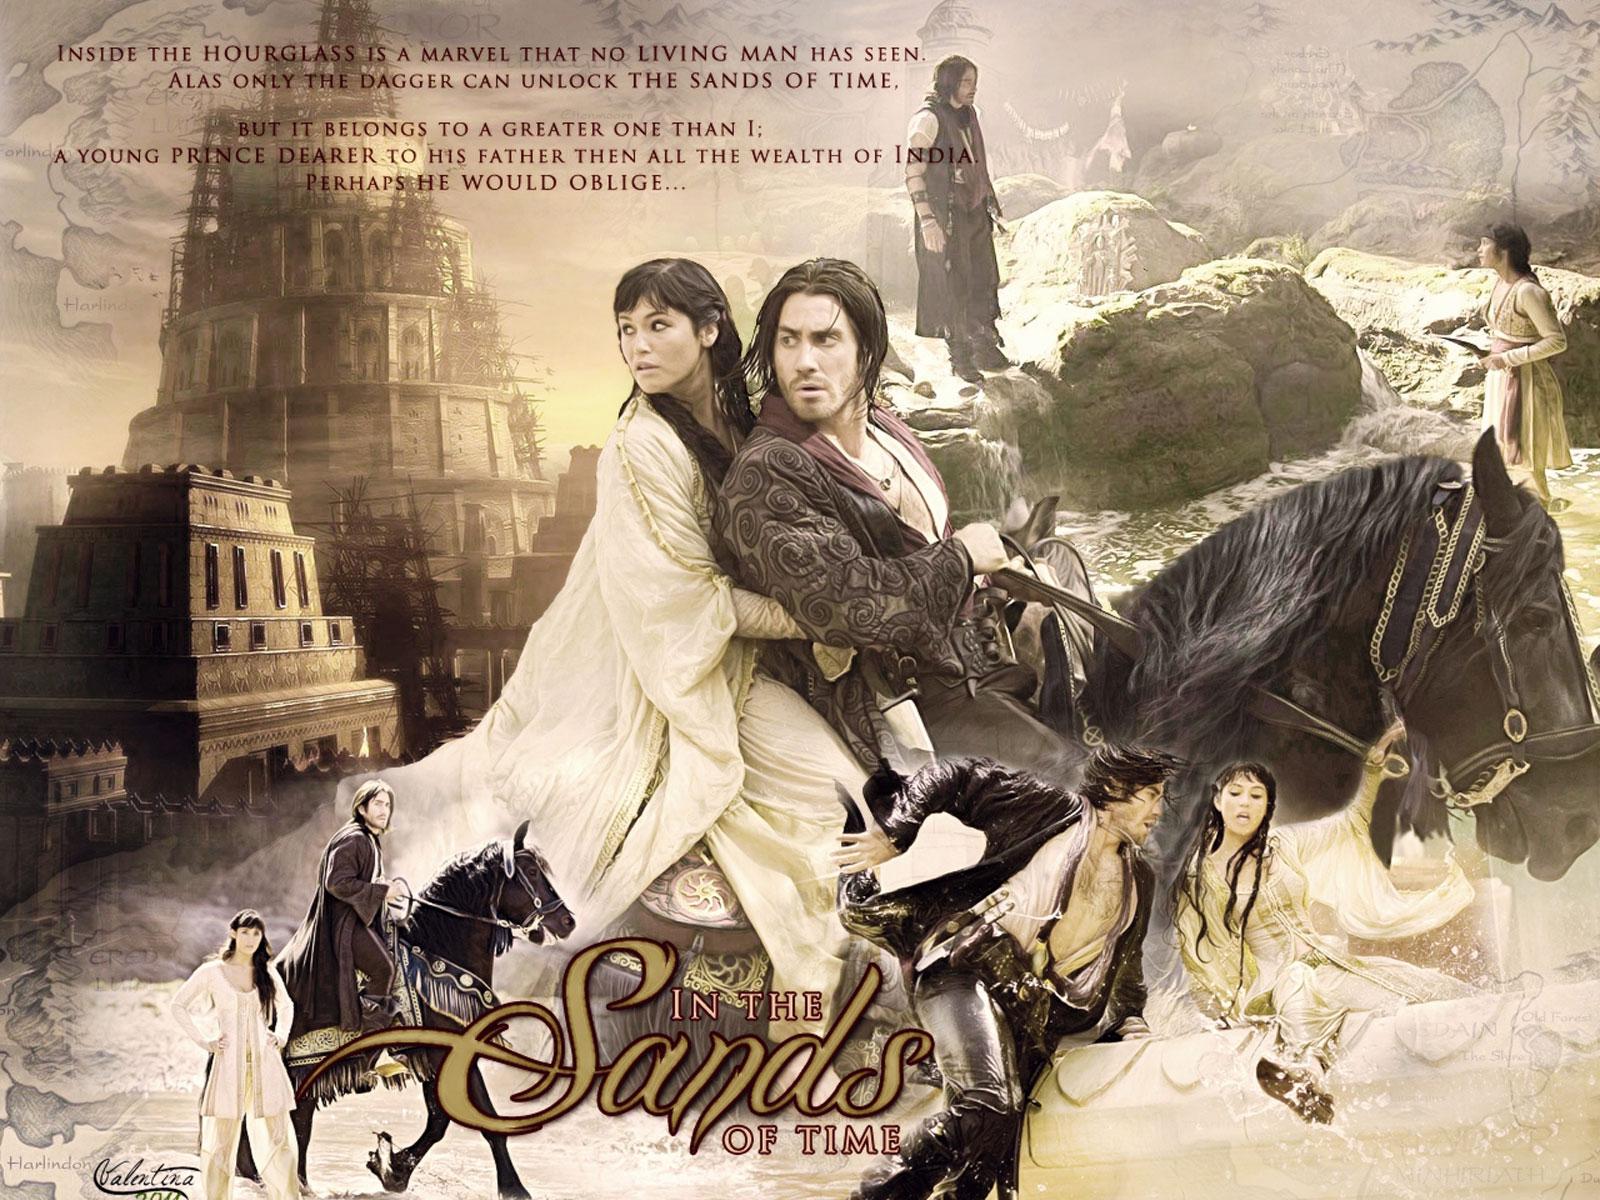 Fantastic Wallpaper Movie Prince Persia - 466080  Pictures_1002025.jpg